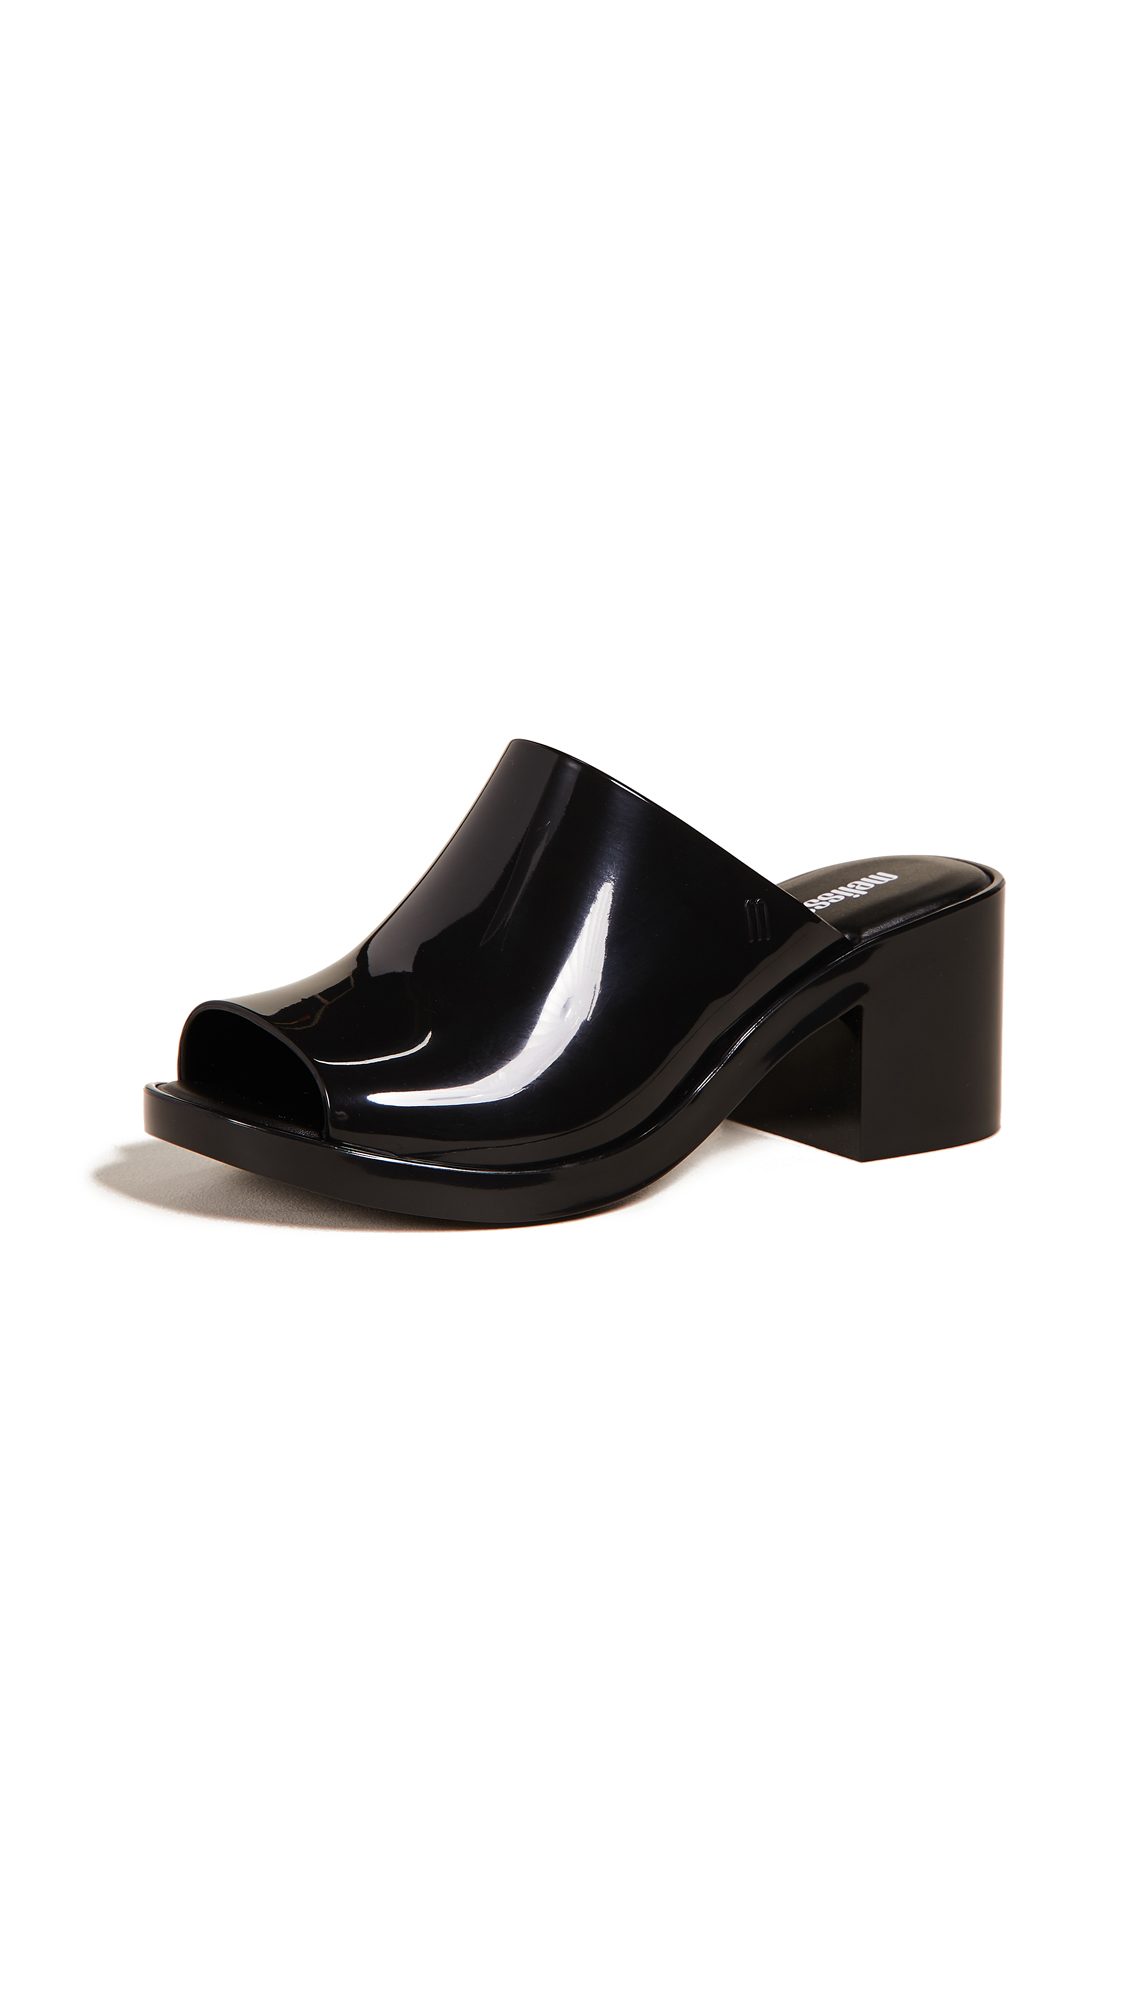 Melissa Mule Open Toe Sandals - Black